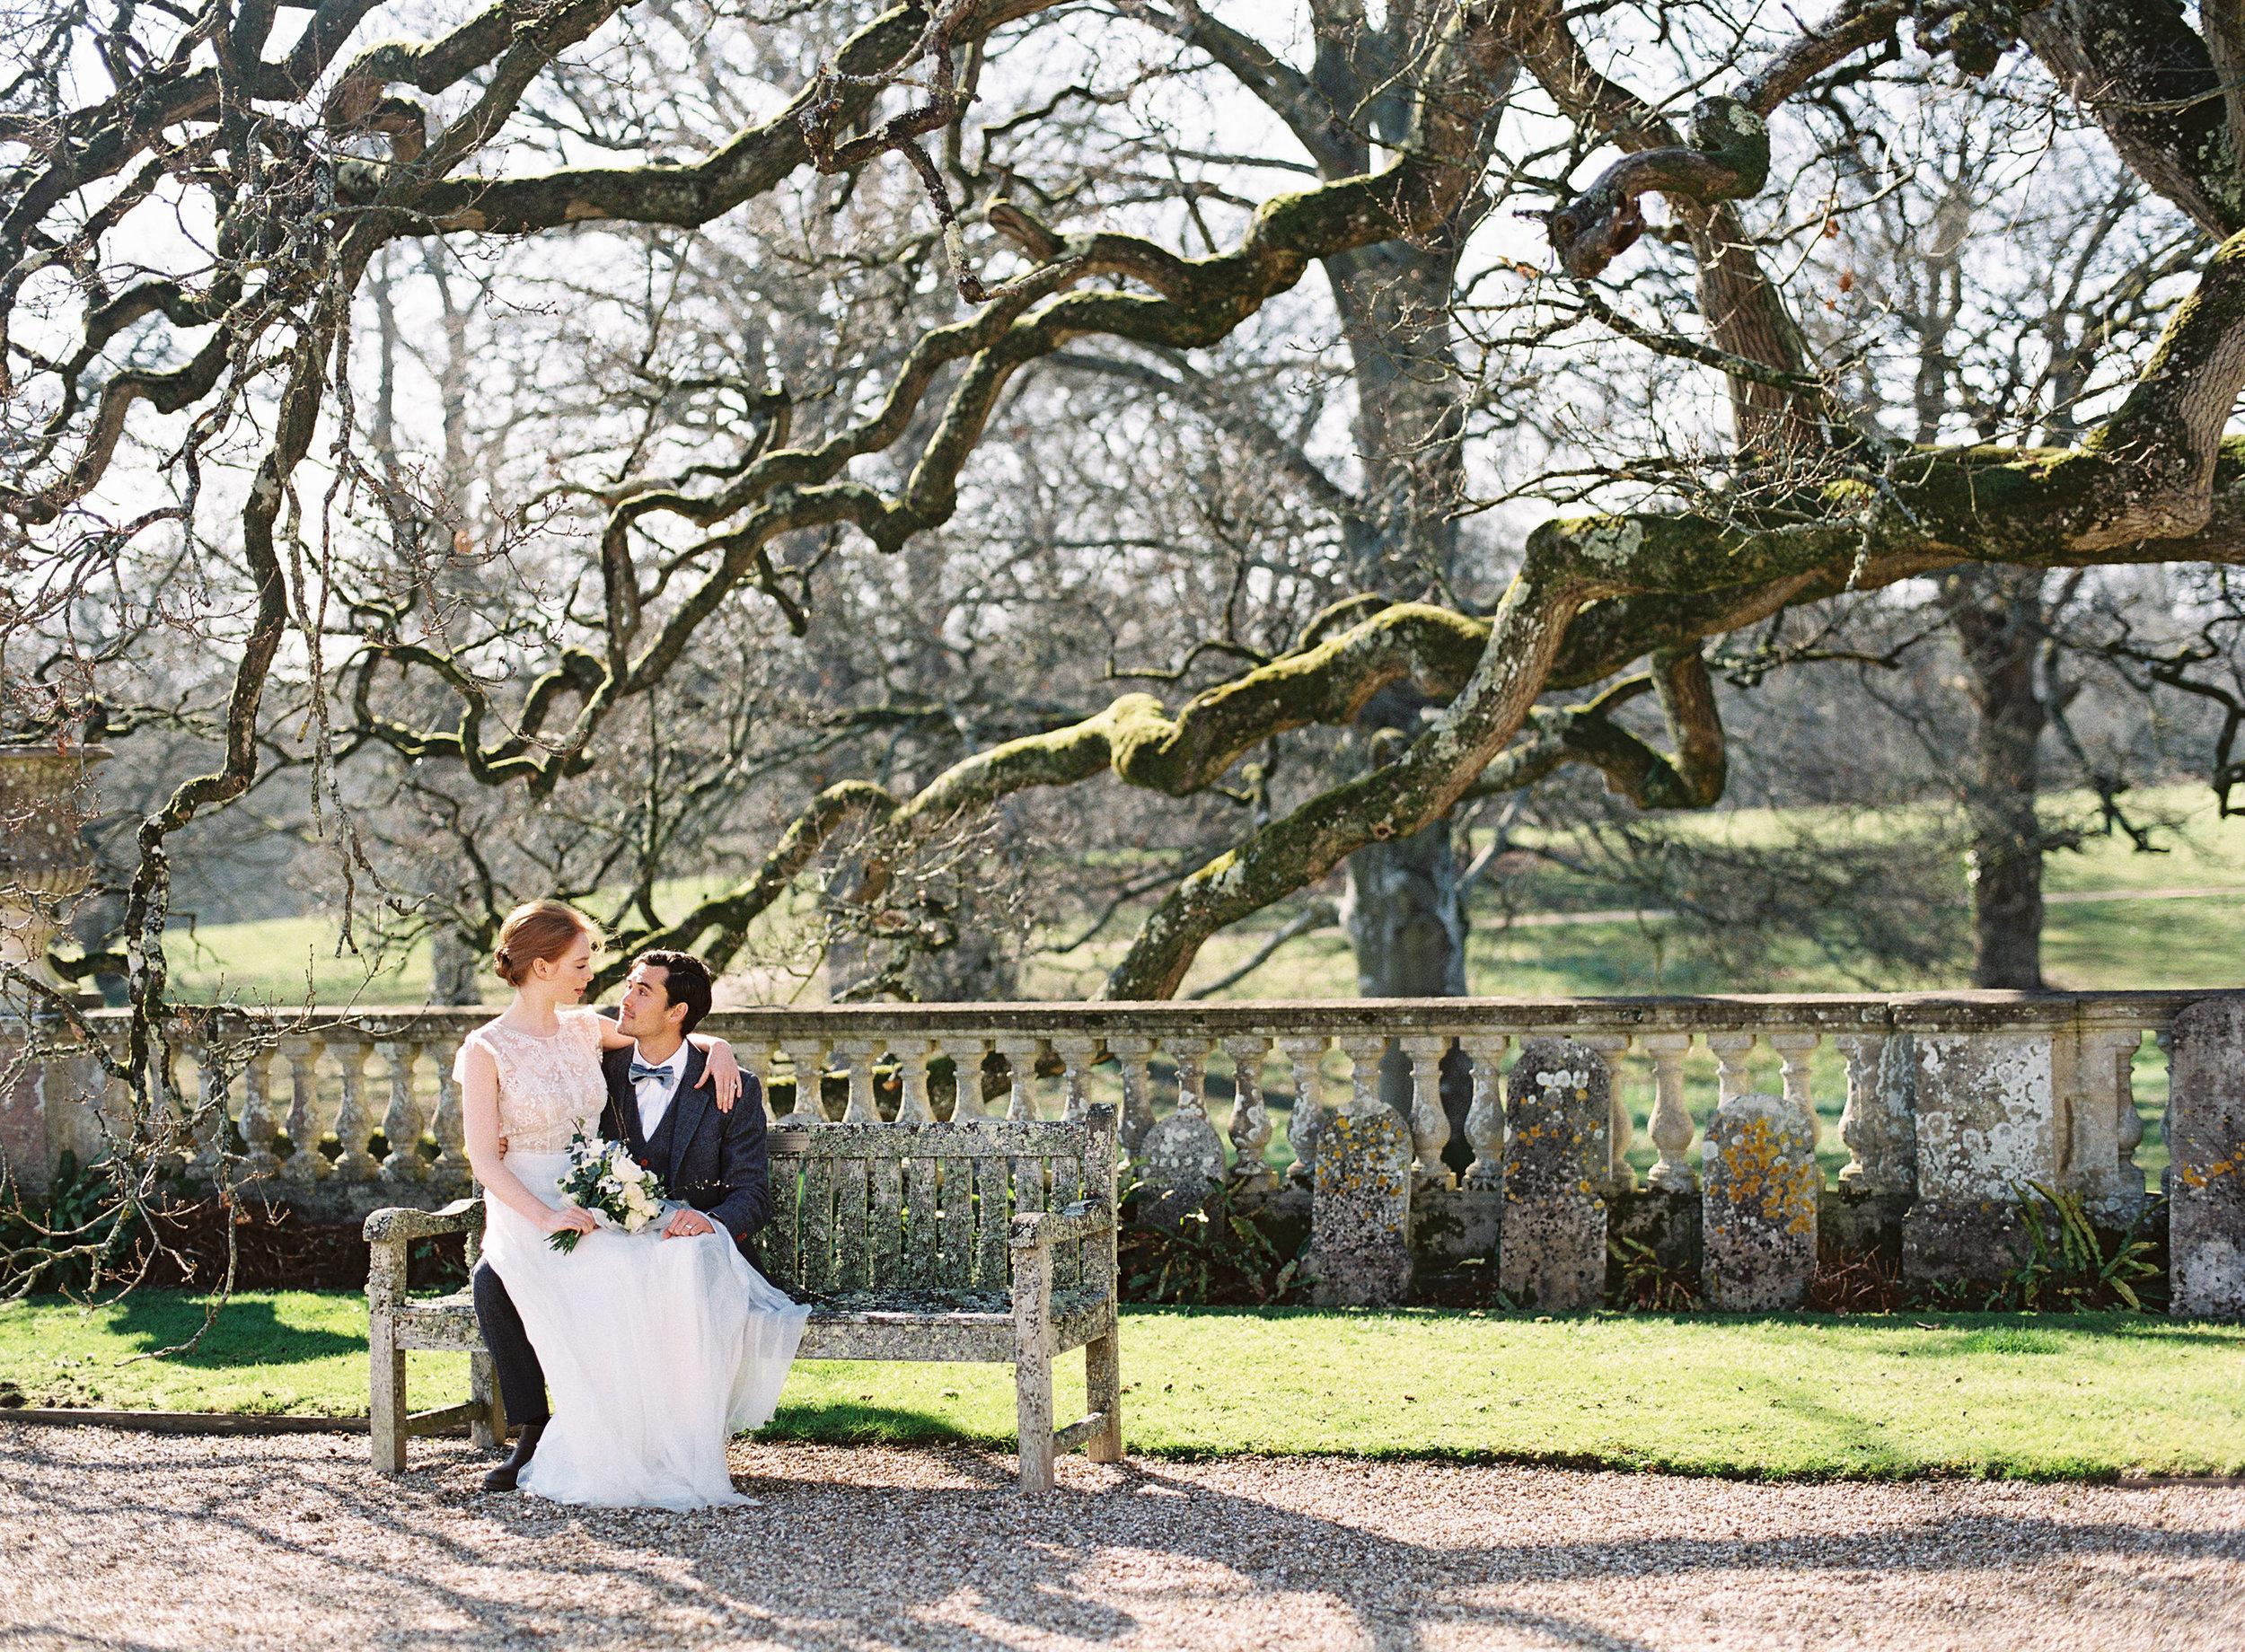 The Timeless Stylist-A Forgotten Love Story-Fine Art Wedding Editorial-Heirloom Wedding Styling 44.jpg